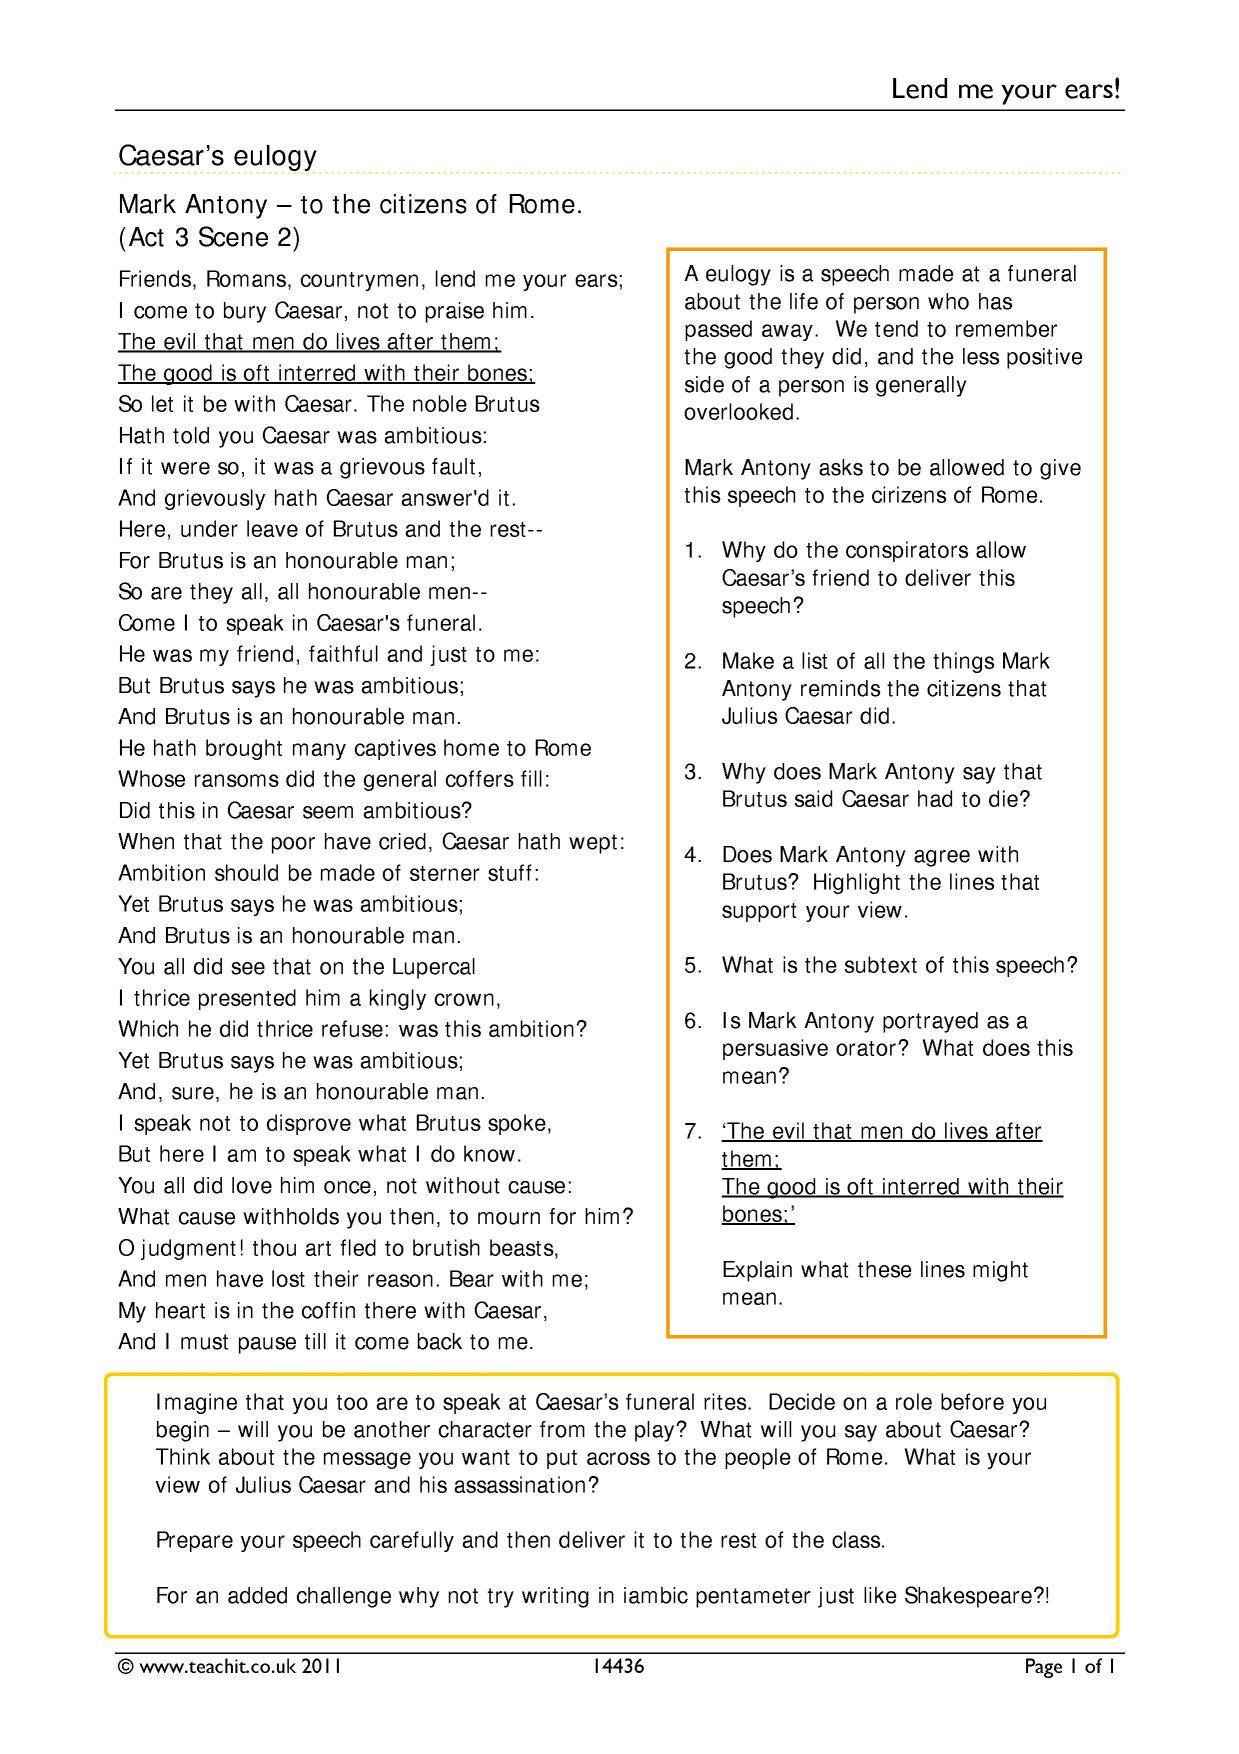 ks julius caesar teachit english 1 preview